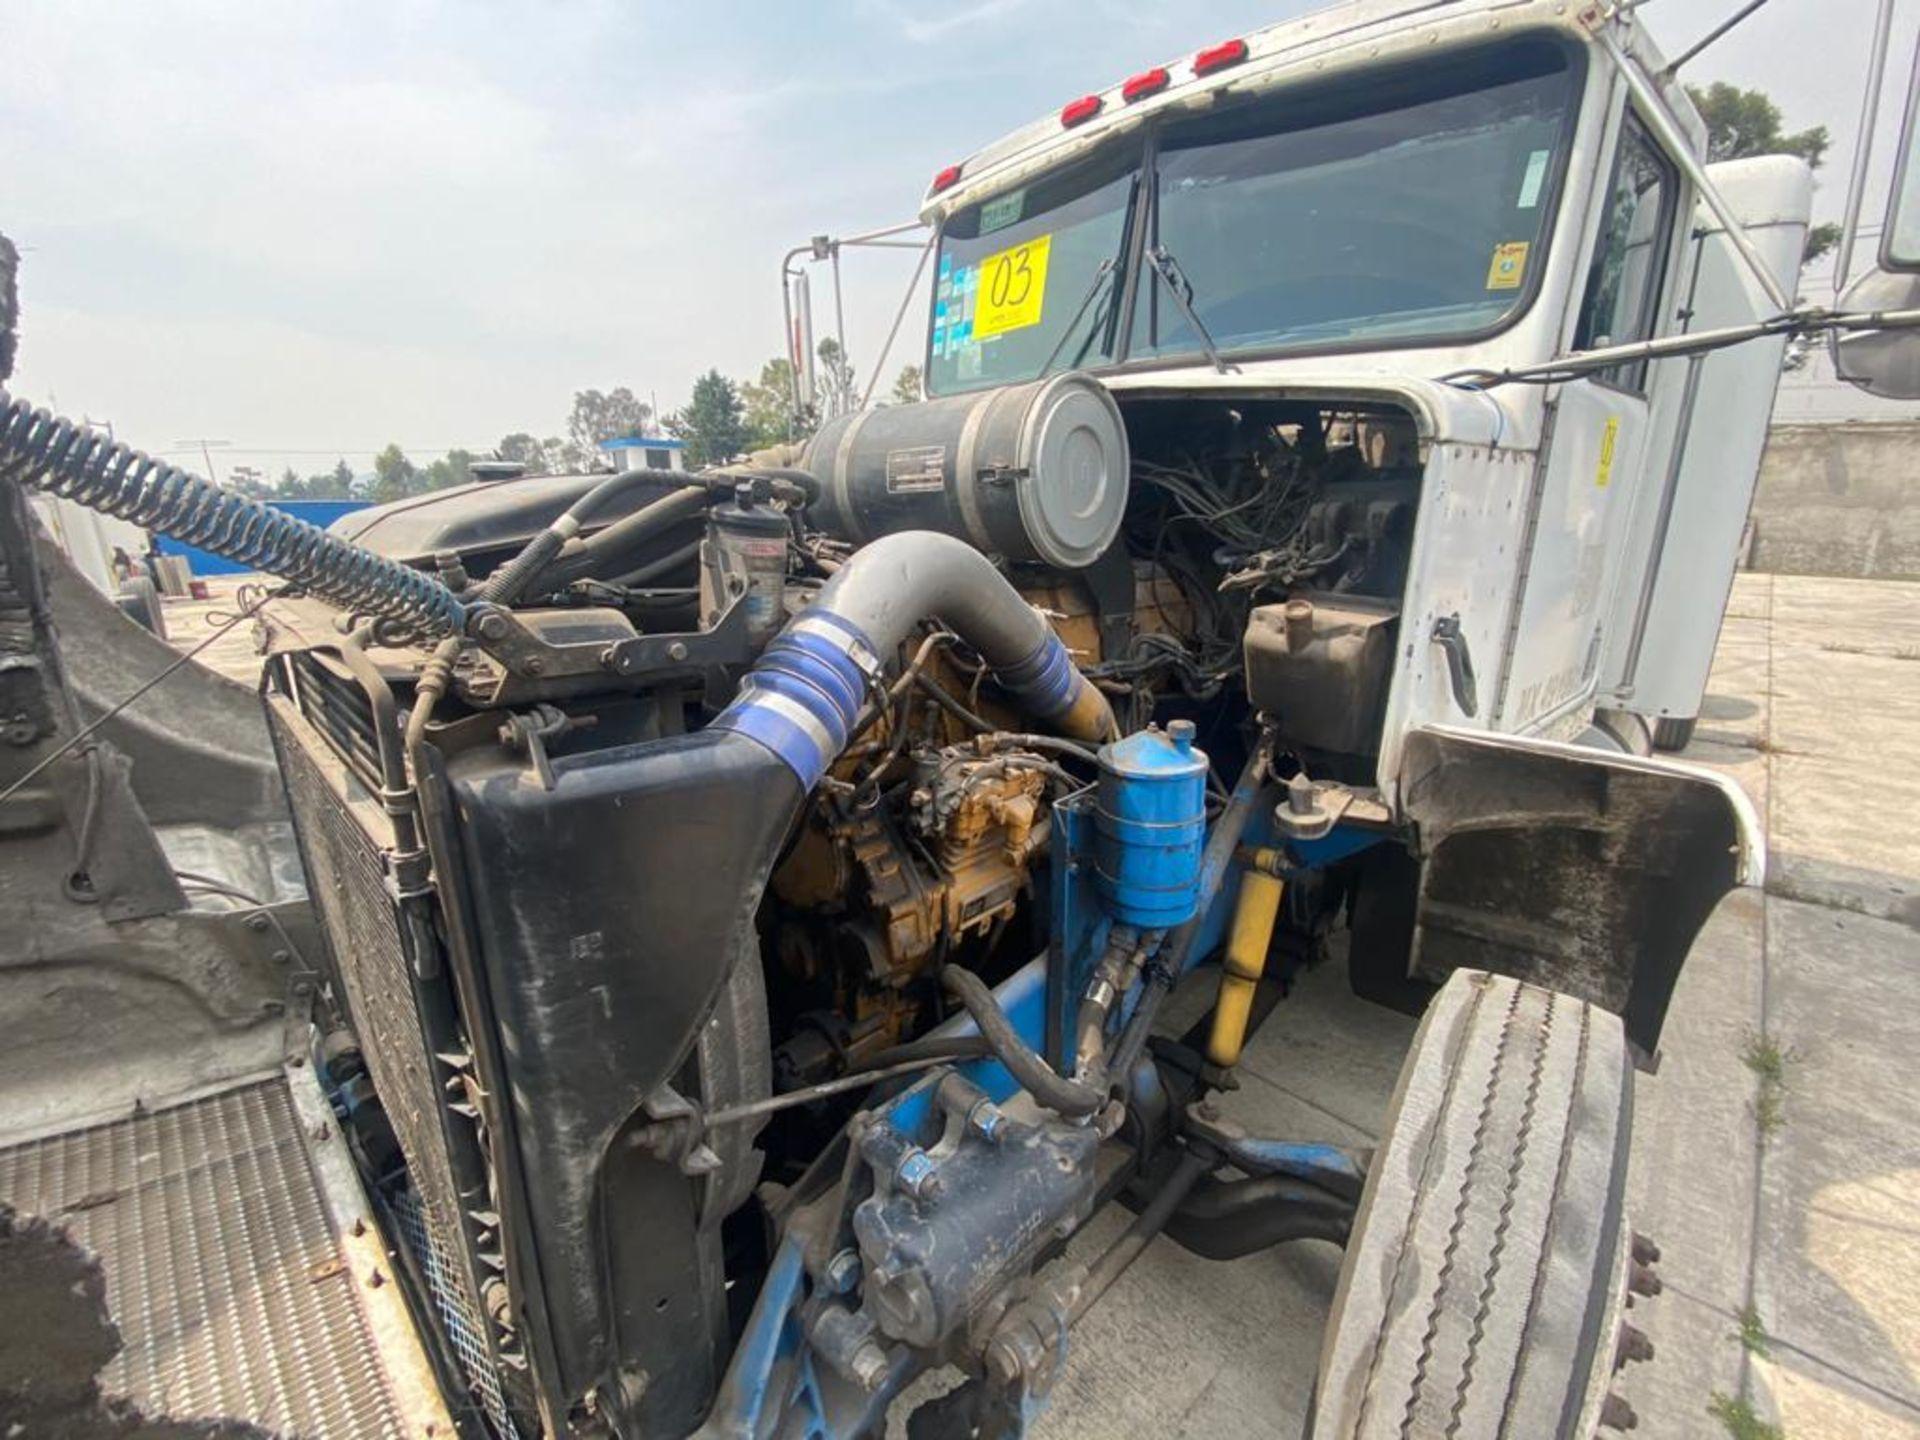 1999 Kenworth Sleeper truck tractor, standard transmission of 18 speeds - Image 48 of 62